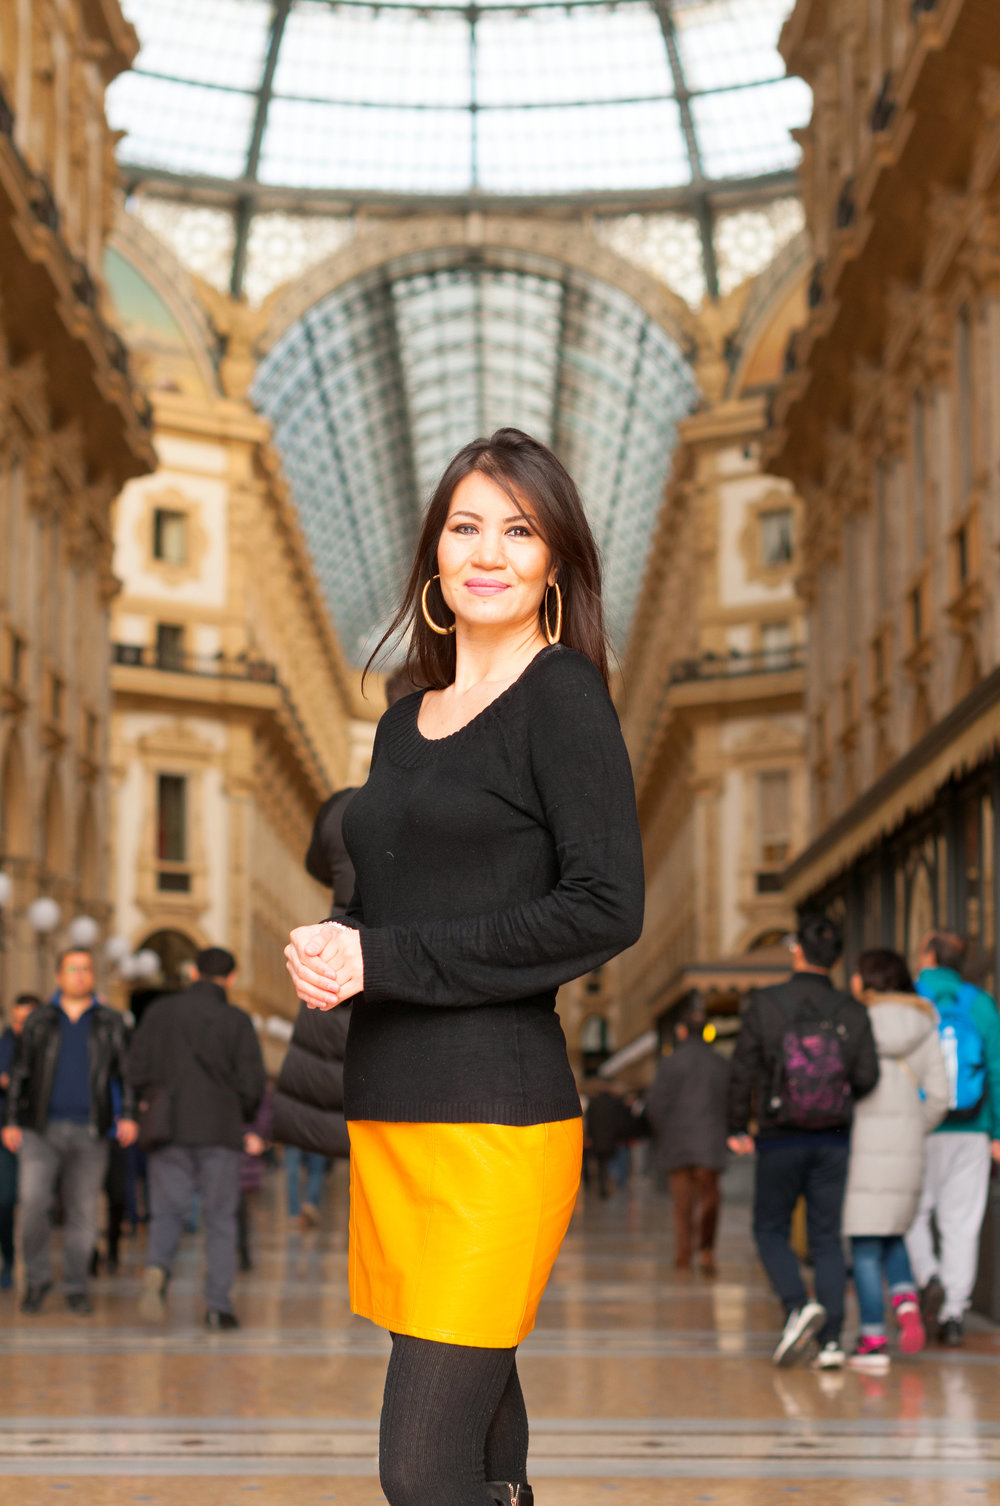 Photography by Tigran Margaryan | Milano, Italy -Galleria Vittorio Emanuele